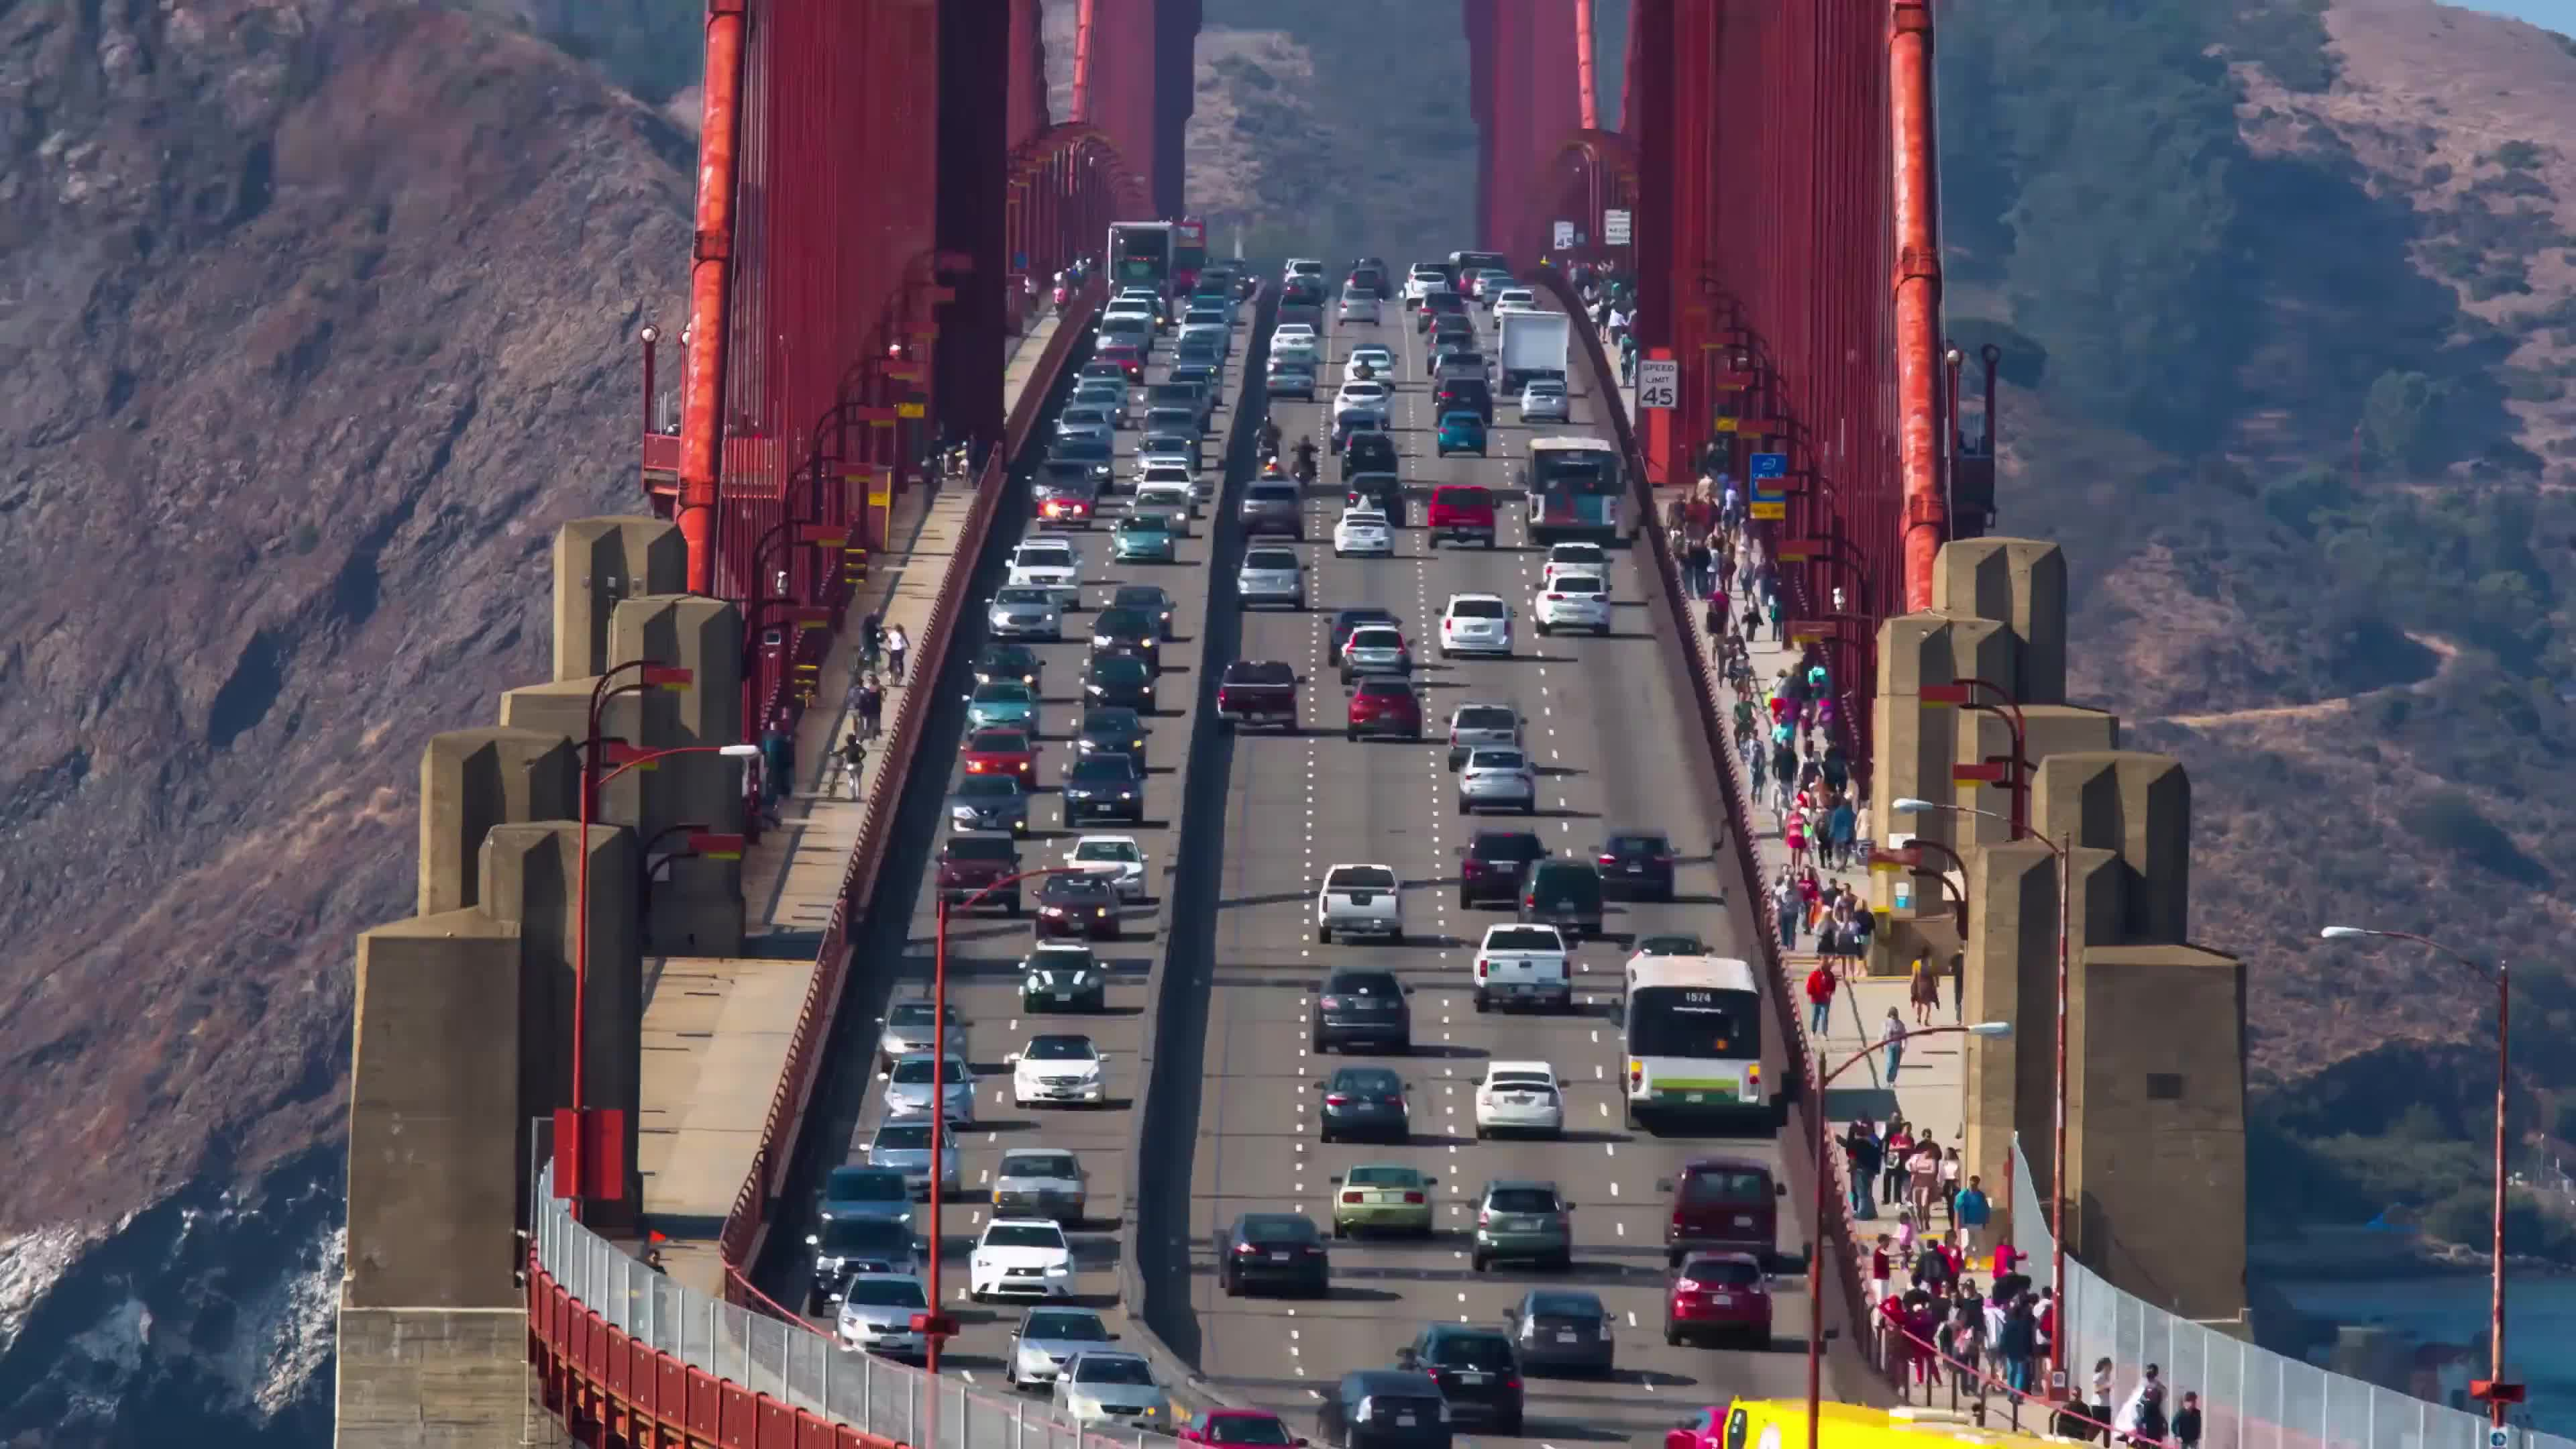 SalazarRED, Lane optimization in the Golden Gate Bridge GIFs